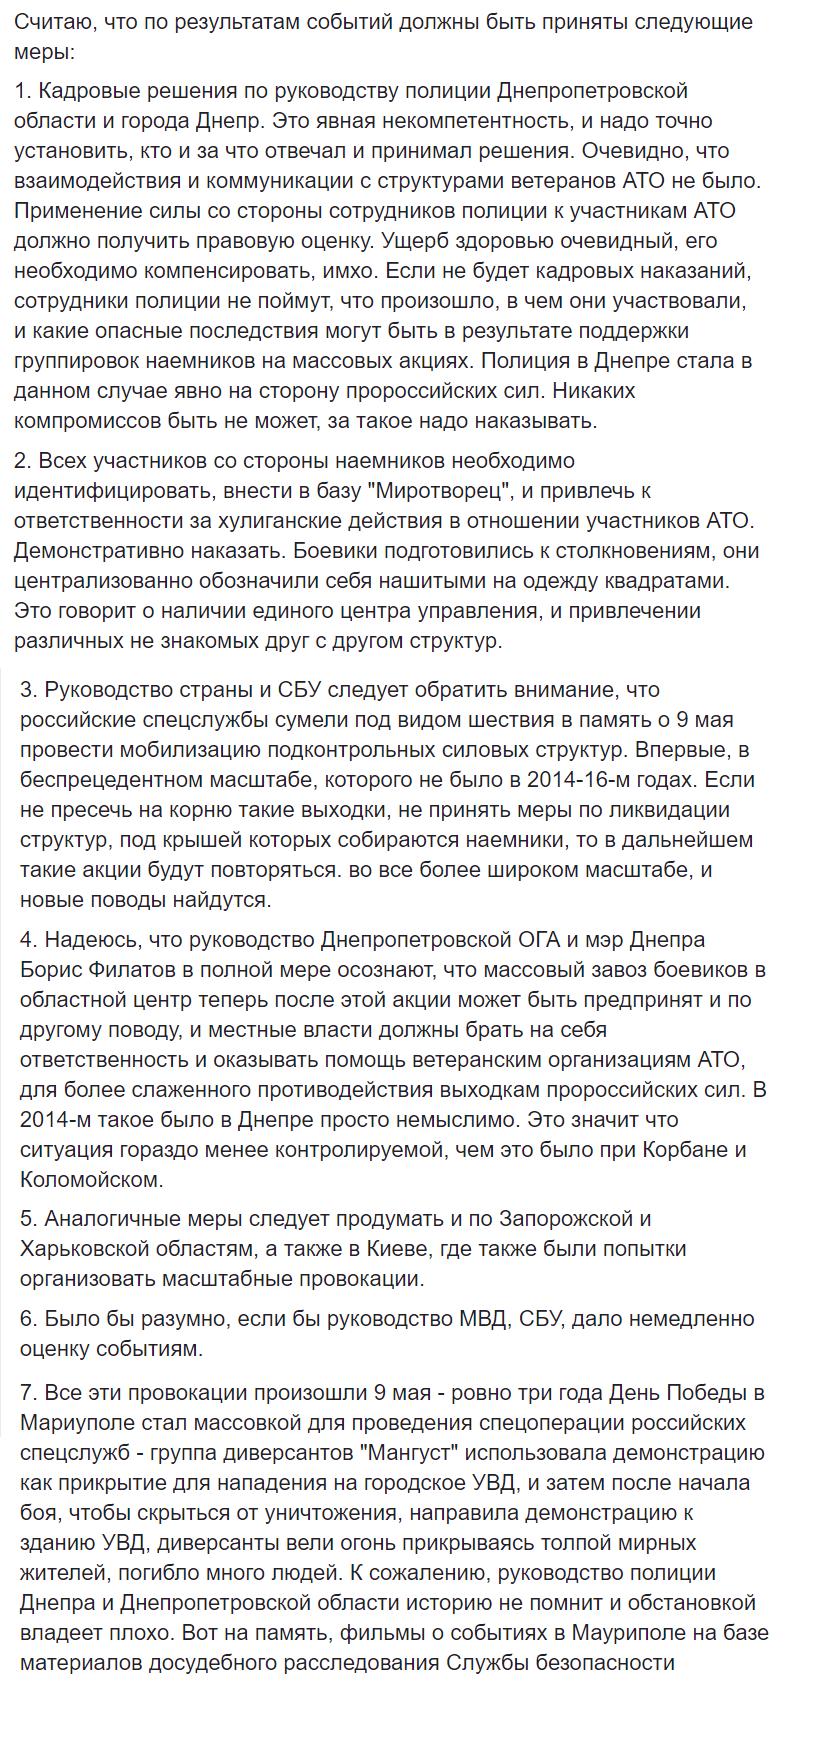 Нардепы хотят взять на поруки задержанного 9 мая активиста ОУН Парфенкова - Цензор.НЕТ 604